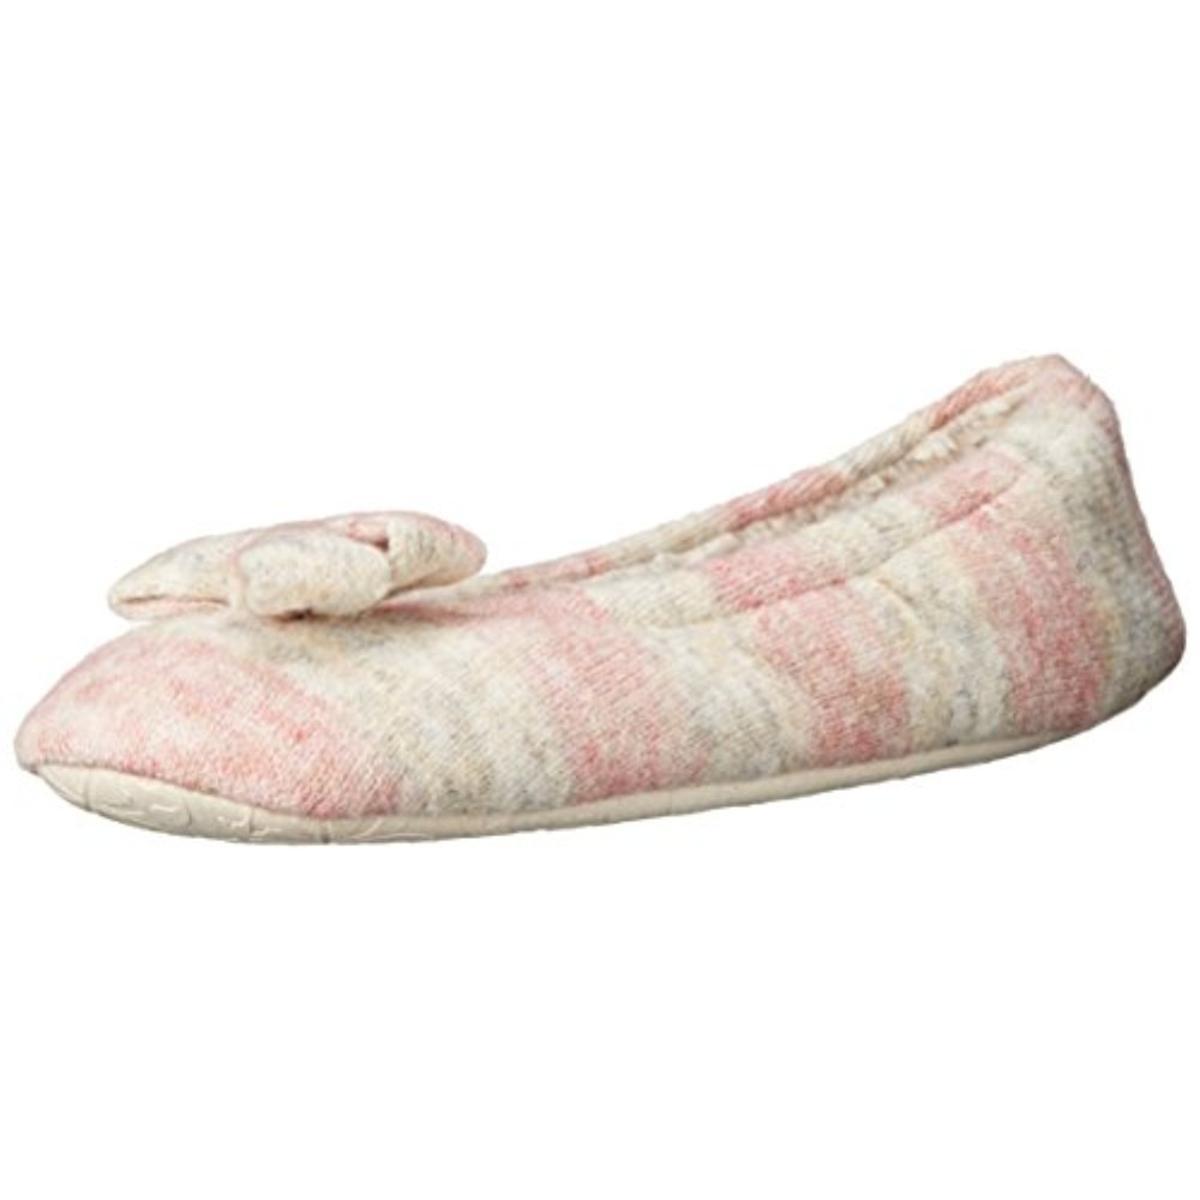 bedroom athletics 6170 womens katy knit flats slip on ballet slippers bhfo ebay. Black Bedroom Furniture Sets. Home Design Ideas